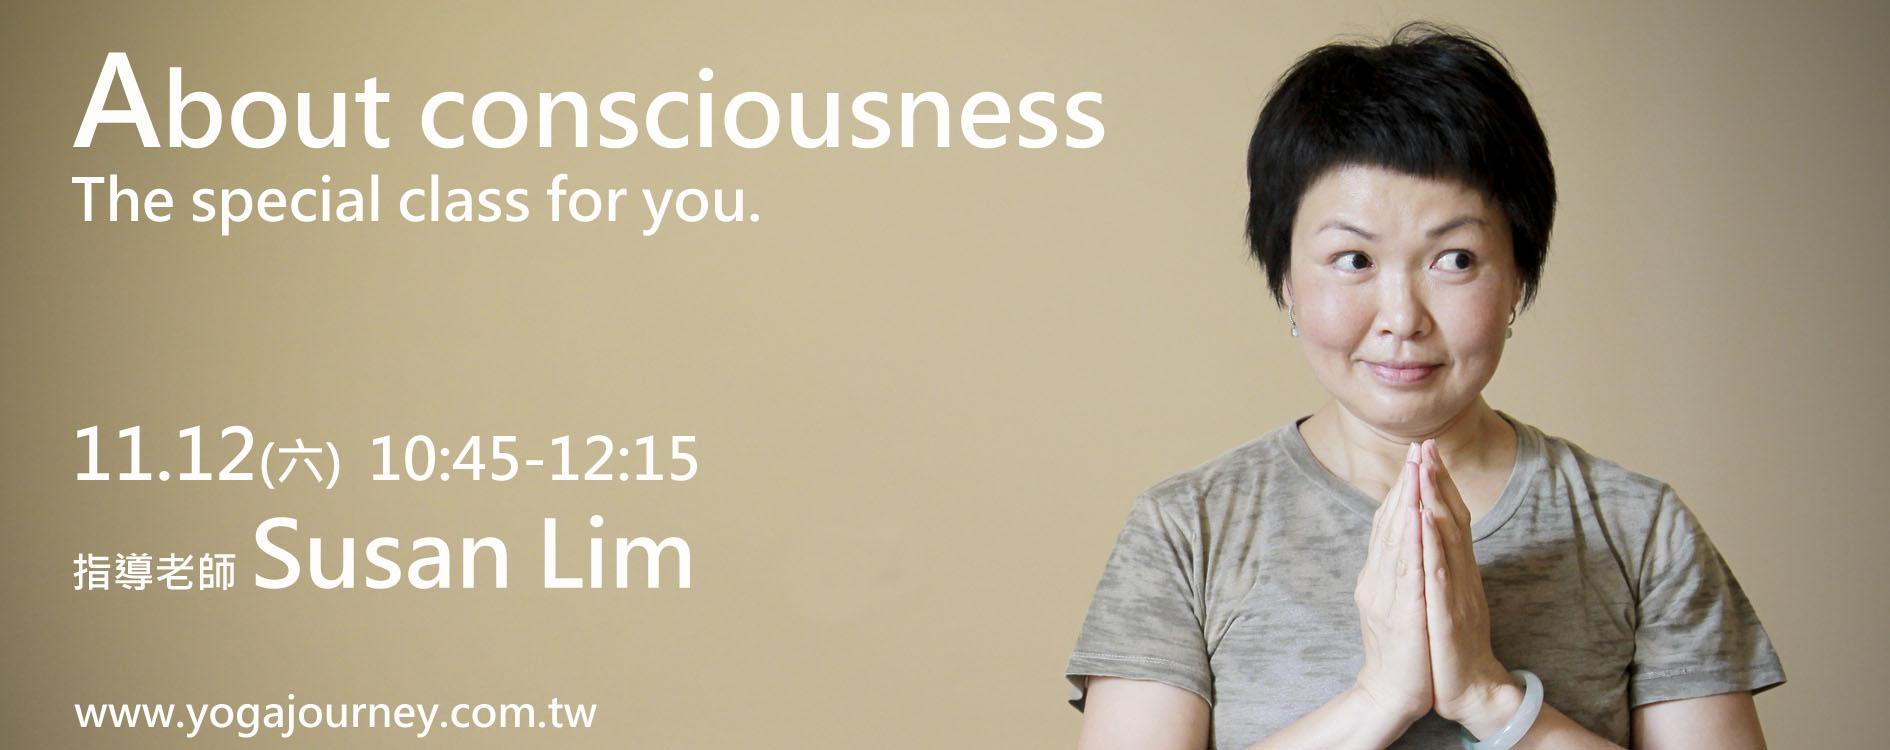 Yoga Journey瑜珈旅程 Susan Lim